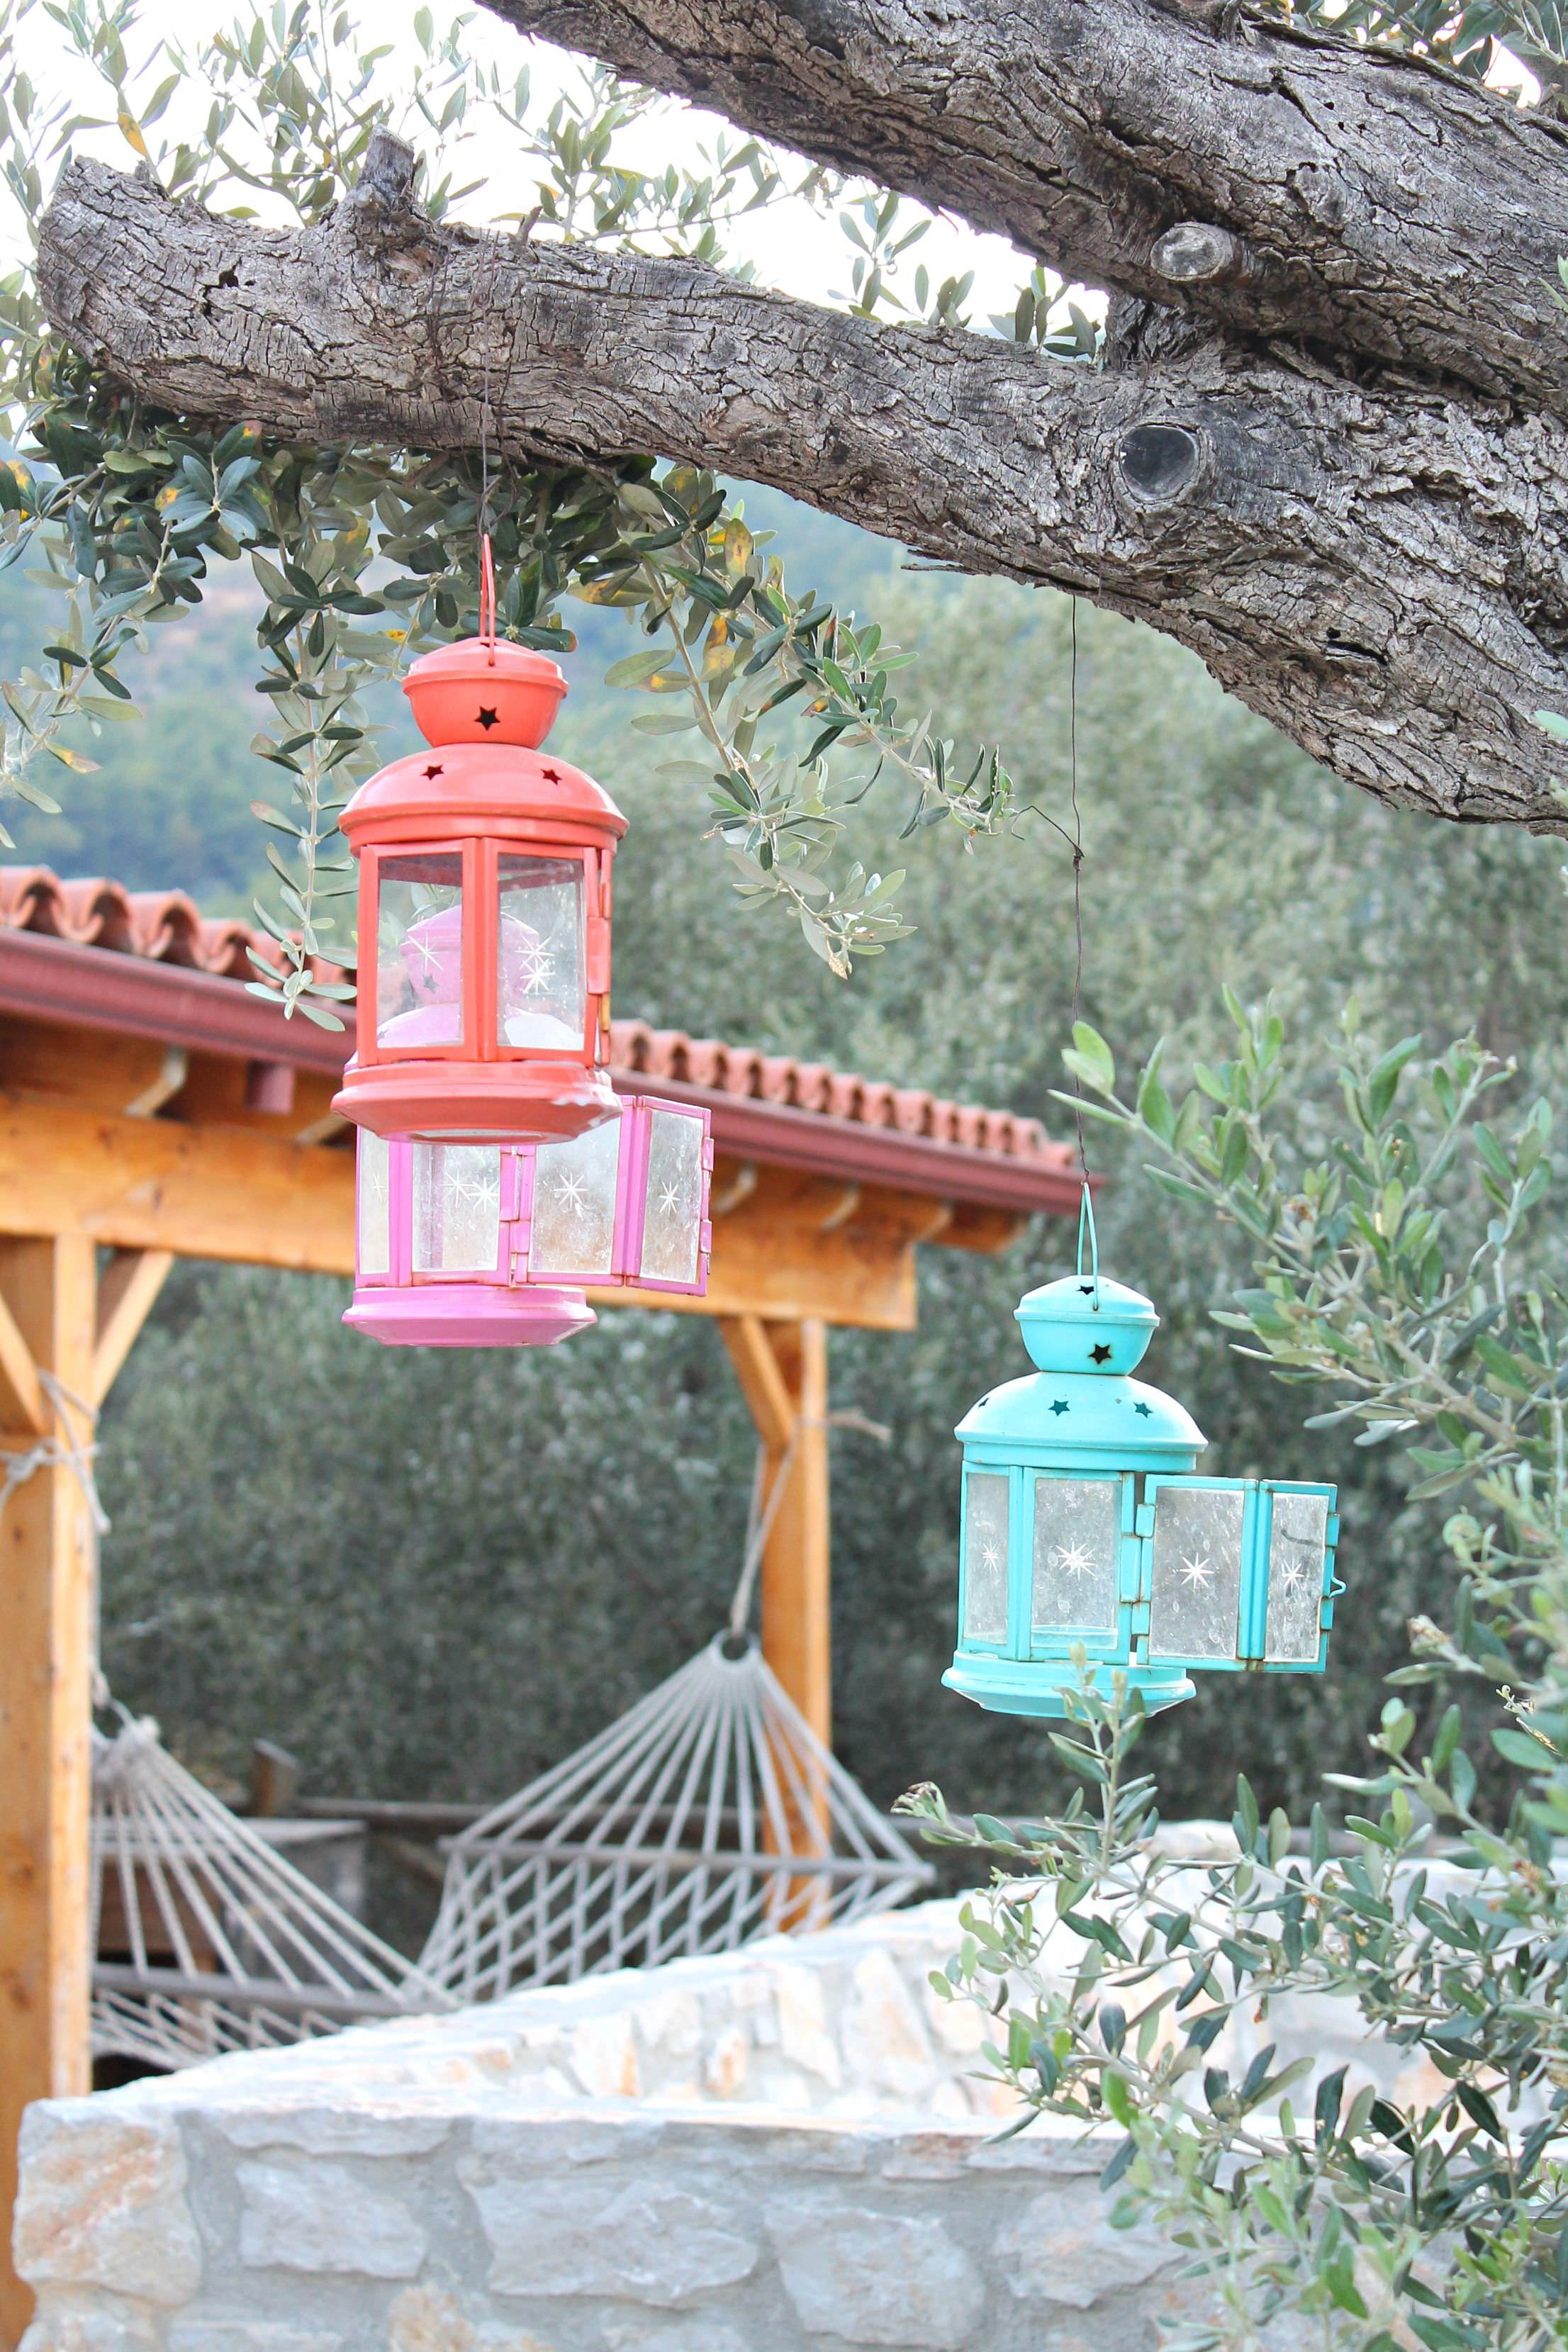 Villa-Olivio-photo-by-Geraldine-Tan-Little-Big-Bell